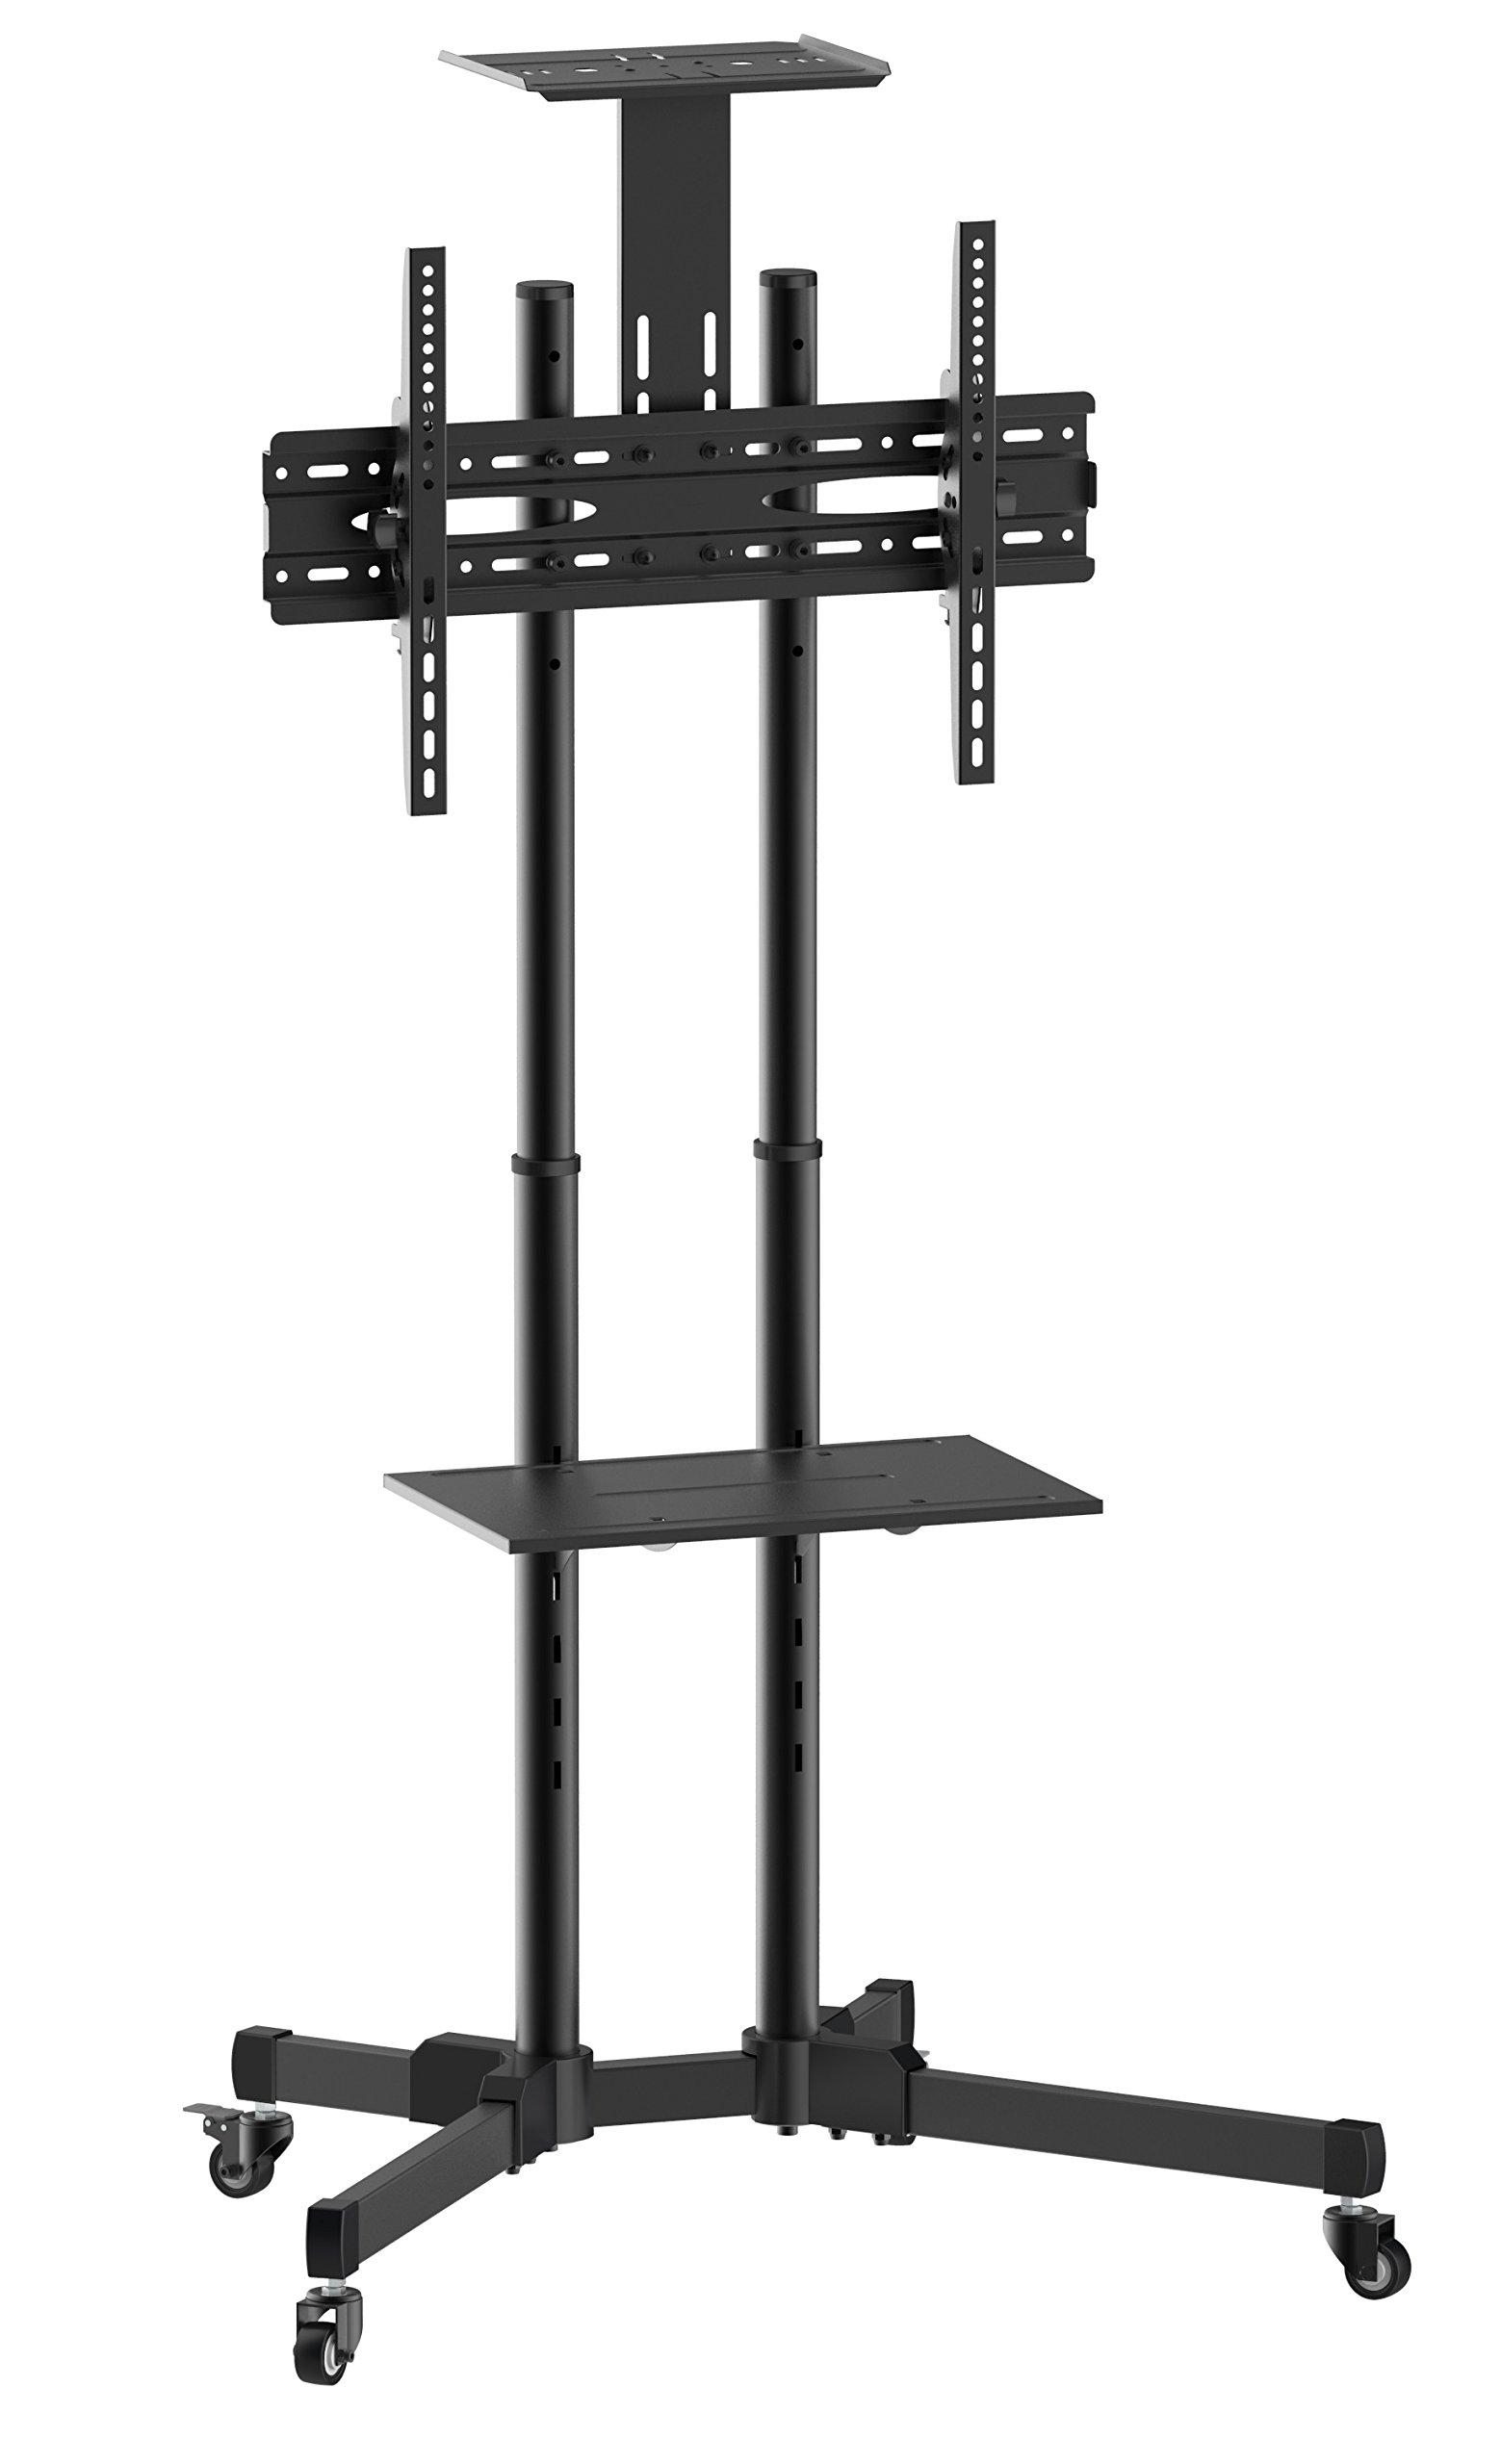 Inland Multifunctional Cart Trolley Black (05446)